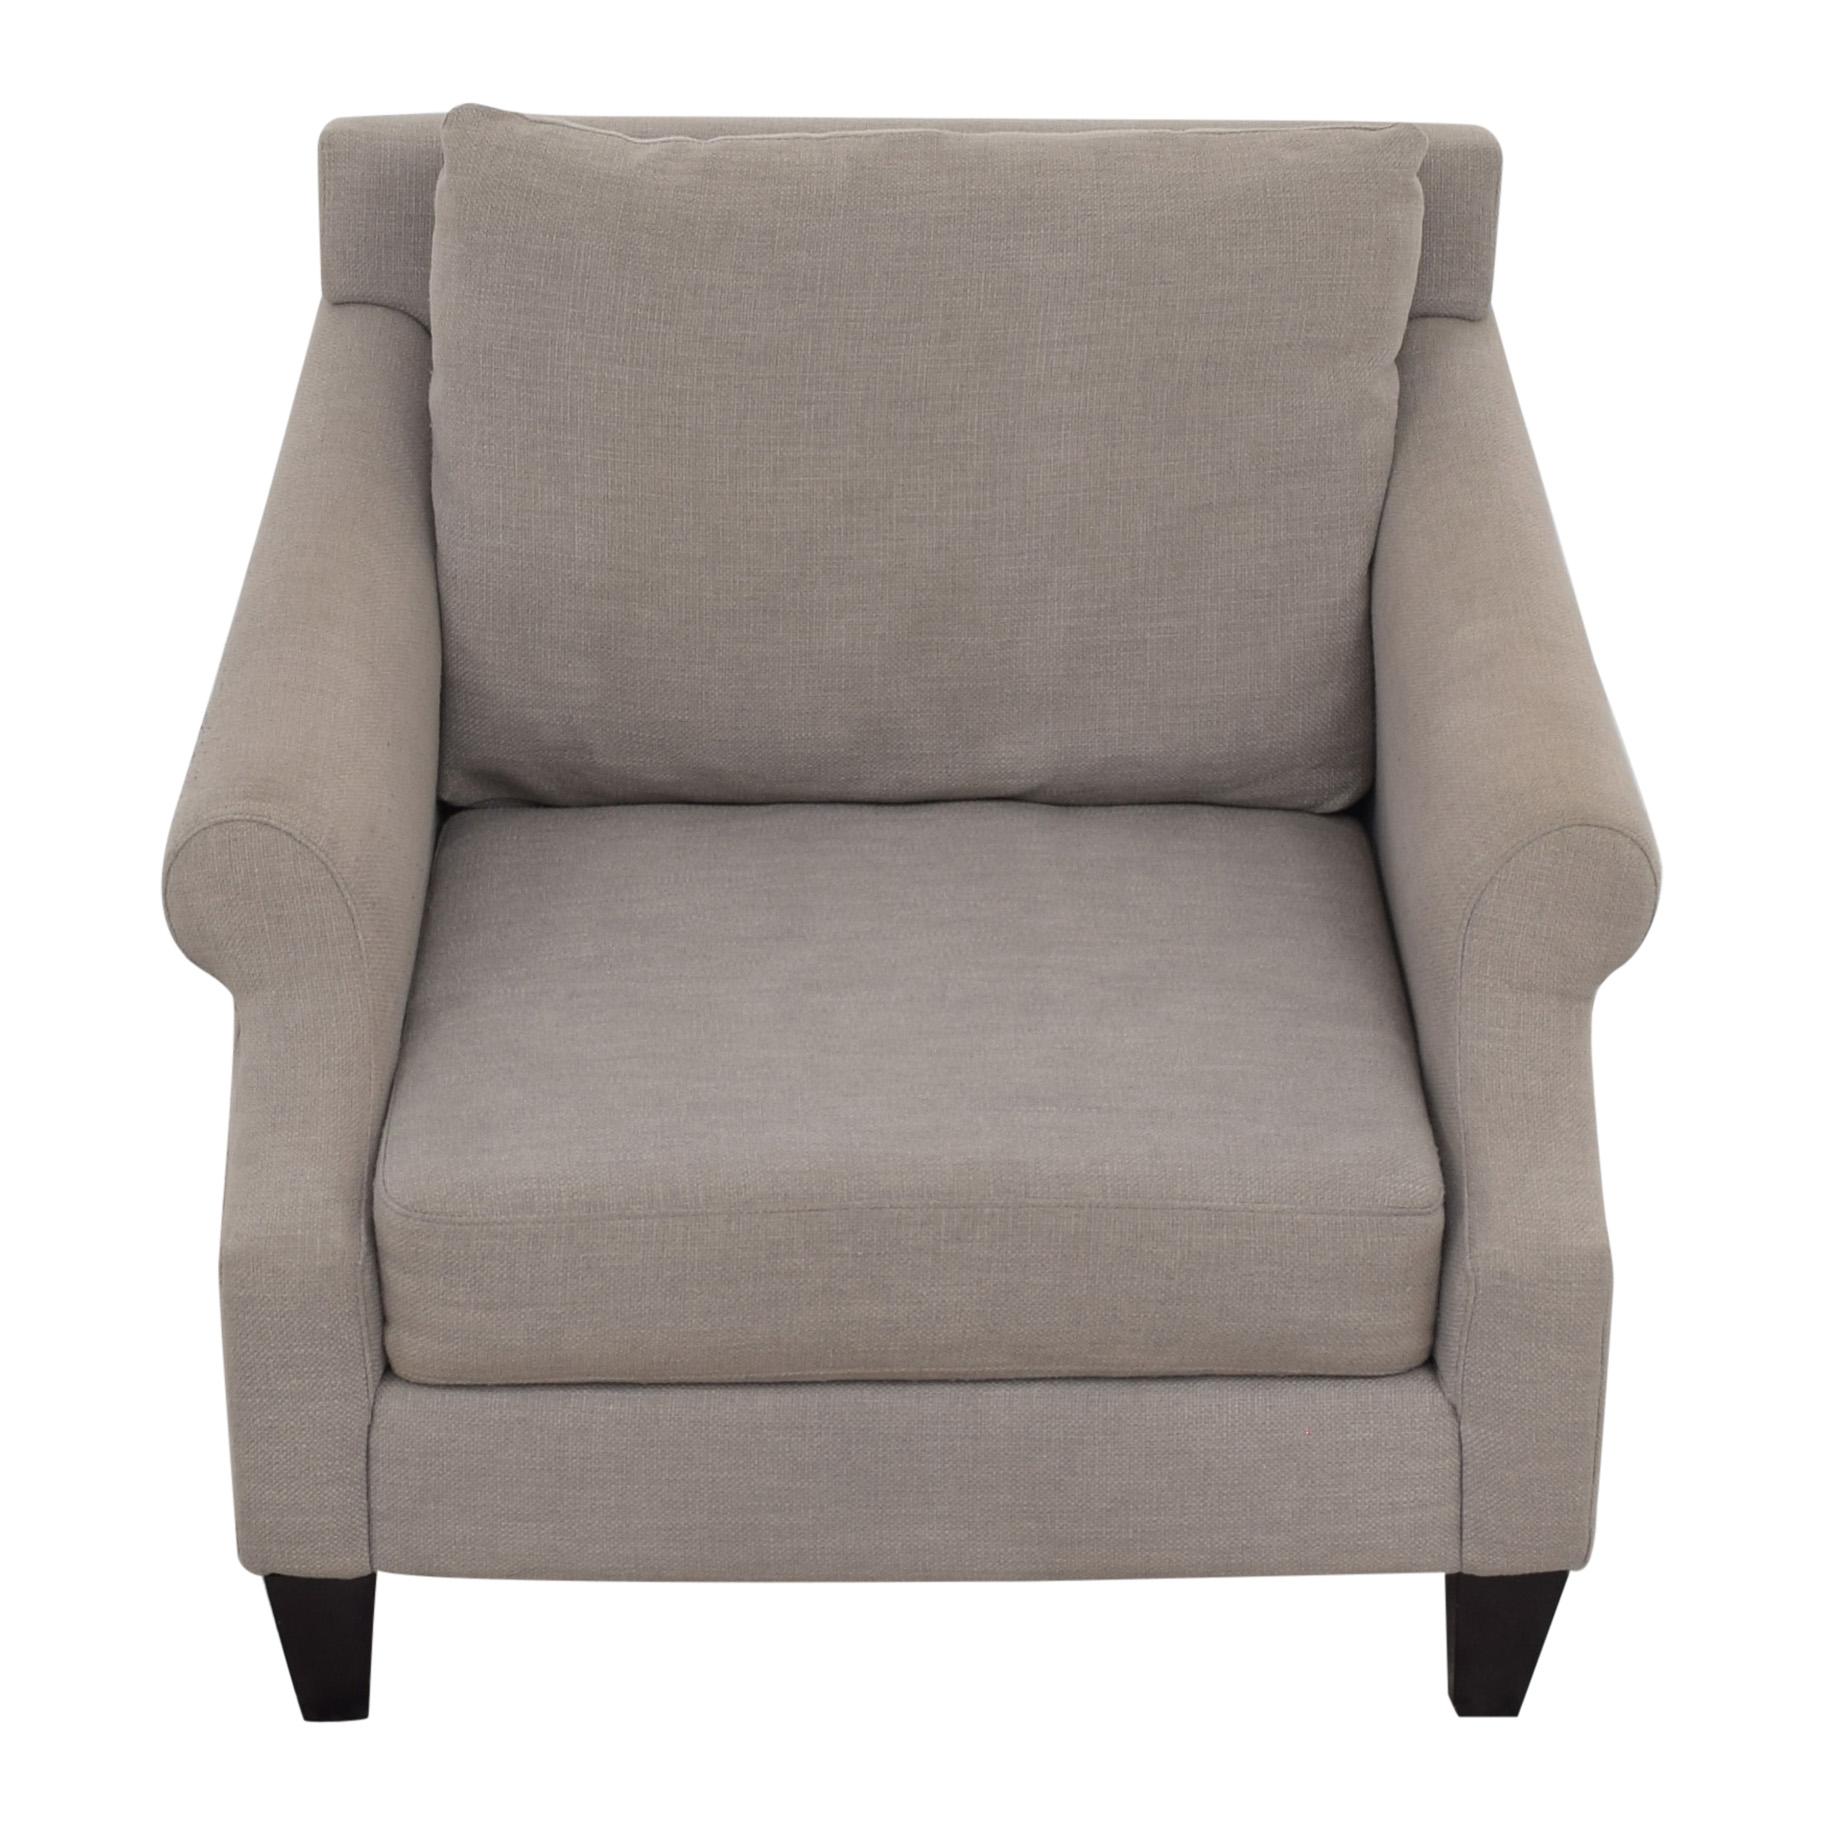 shop Bauhaus Furniture Chair and Ottoman Bauhaus Furniture